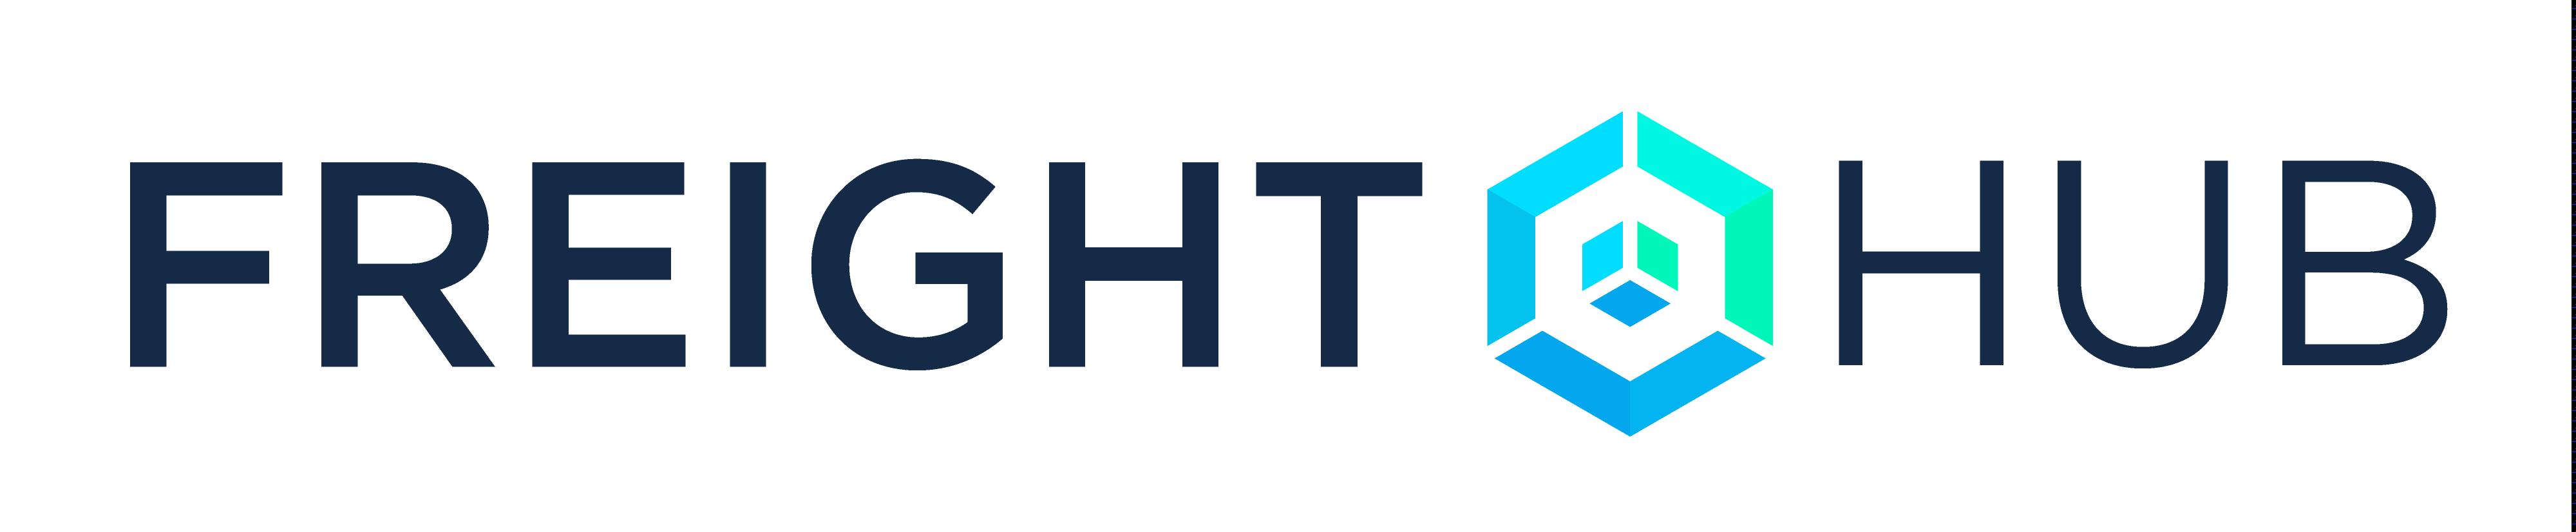 Freight Hub Logo